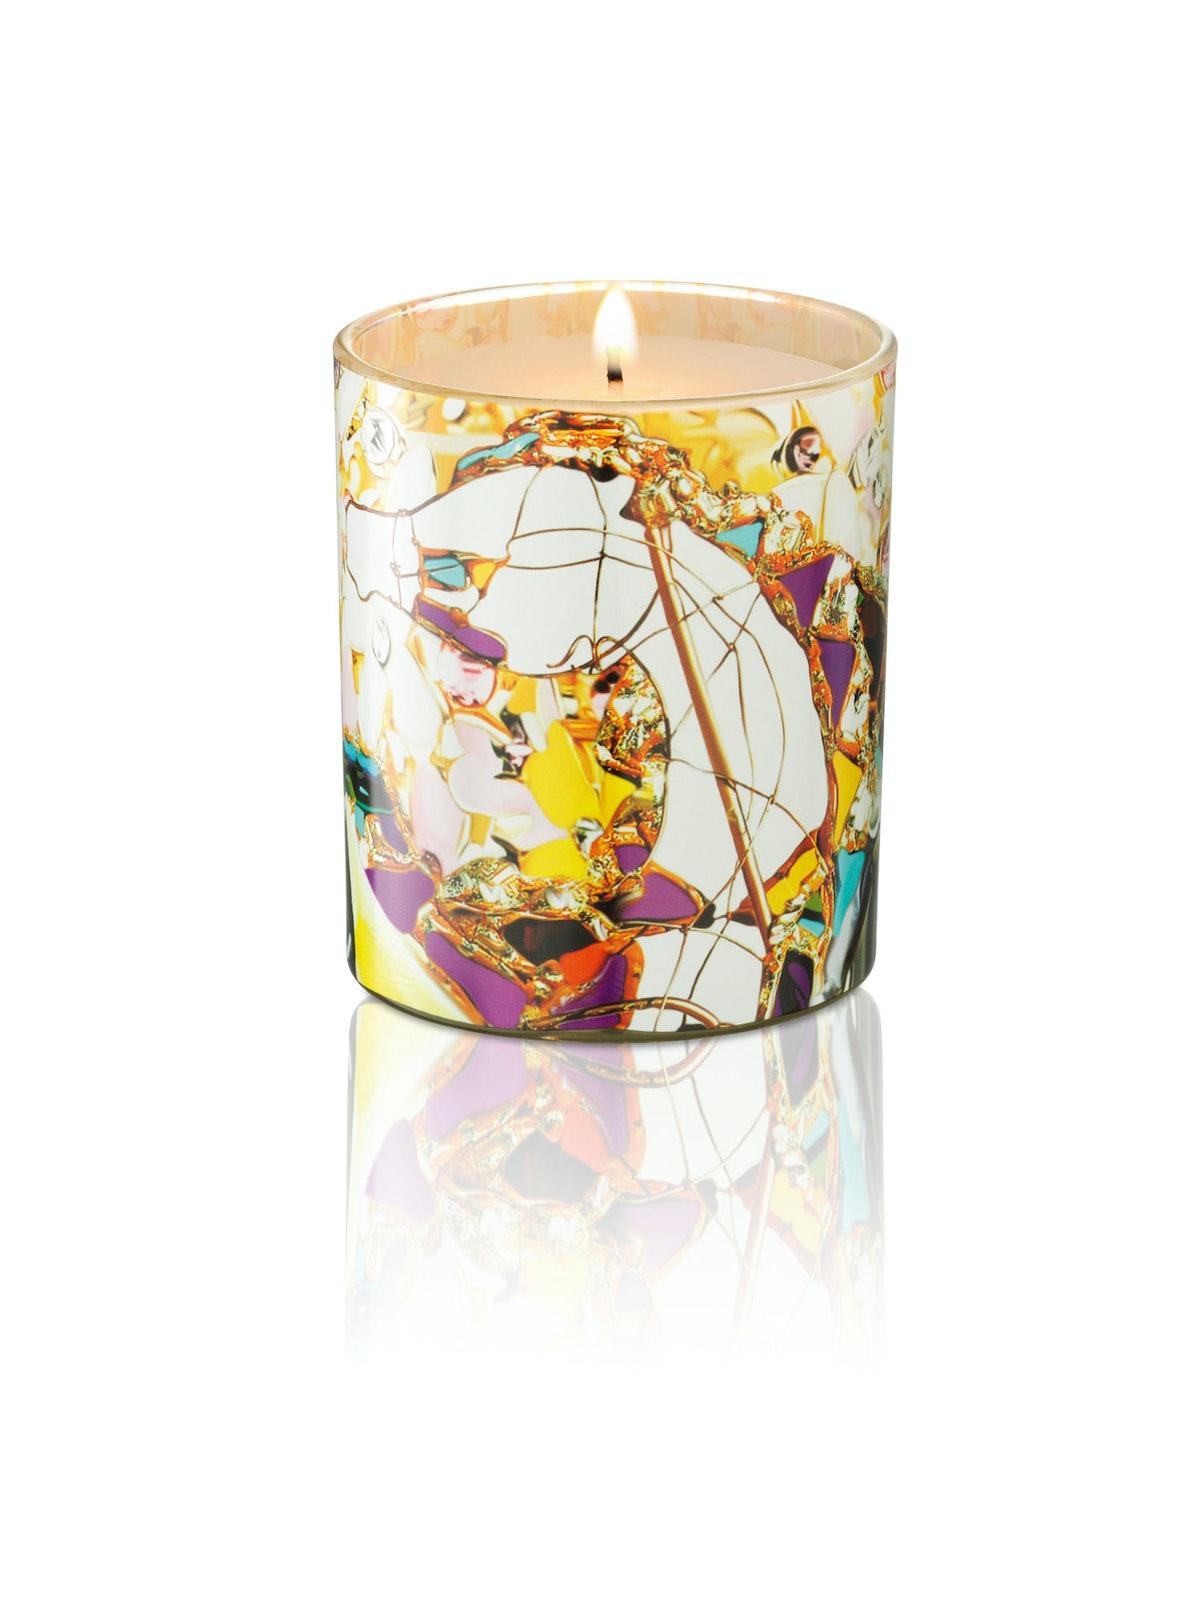 Mary Katrantzou Rodial Candle, $44, [spacenk.com](http://www.spacenk.com).